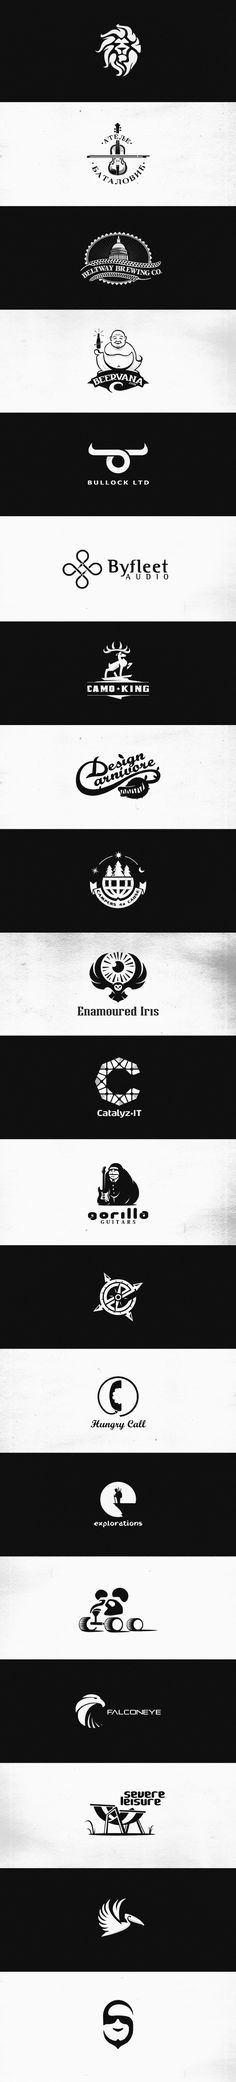 Logos/icon collection 1 on Behance Unique Logo, Cool Logo, Web Design, Icon Design, Creative Logo, Branding, Brand Identity, Symbol Design, Great Logos